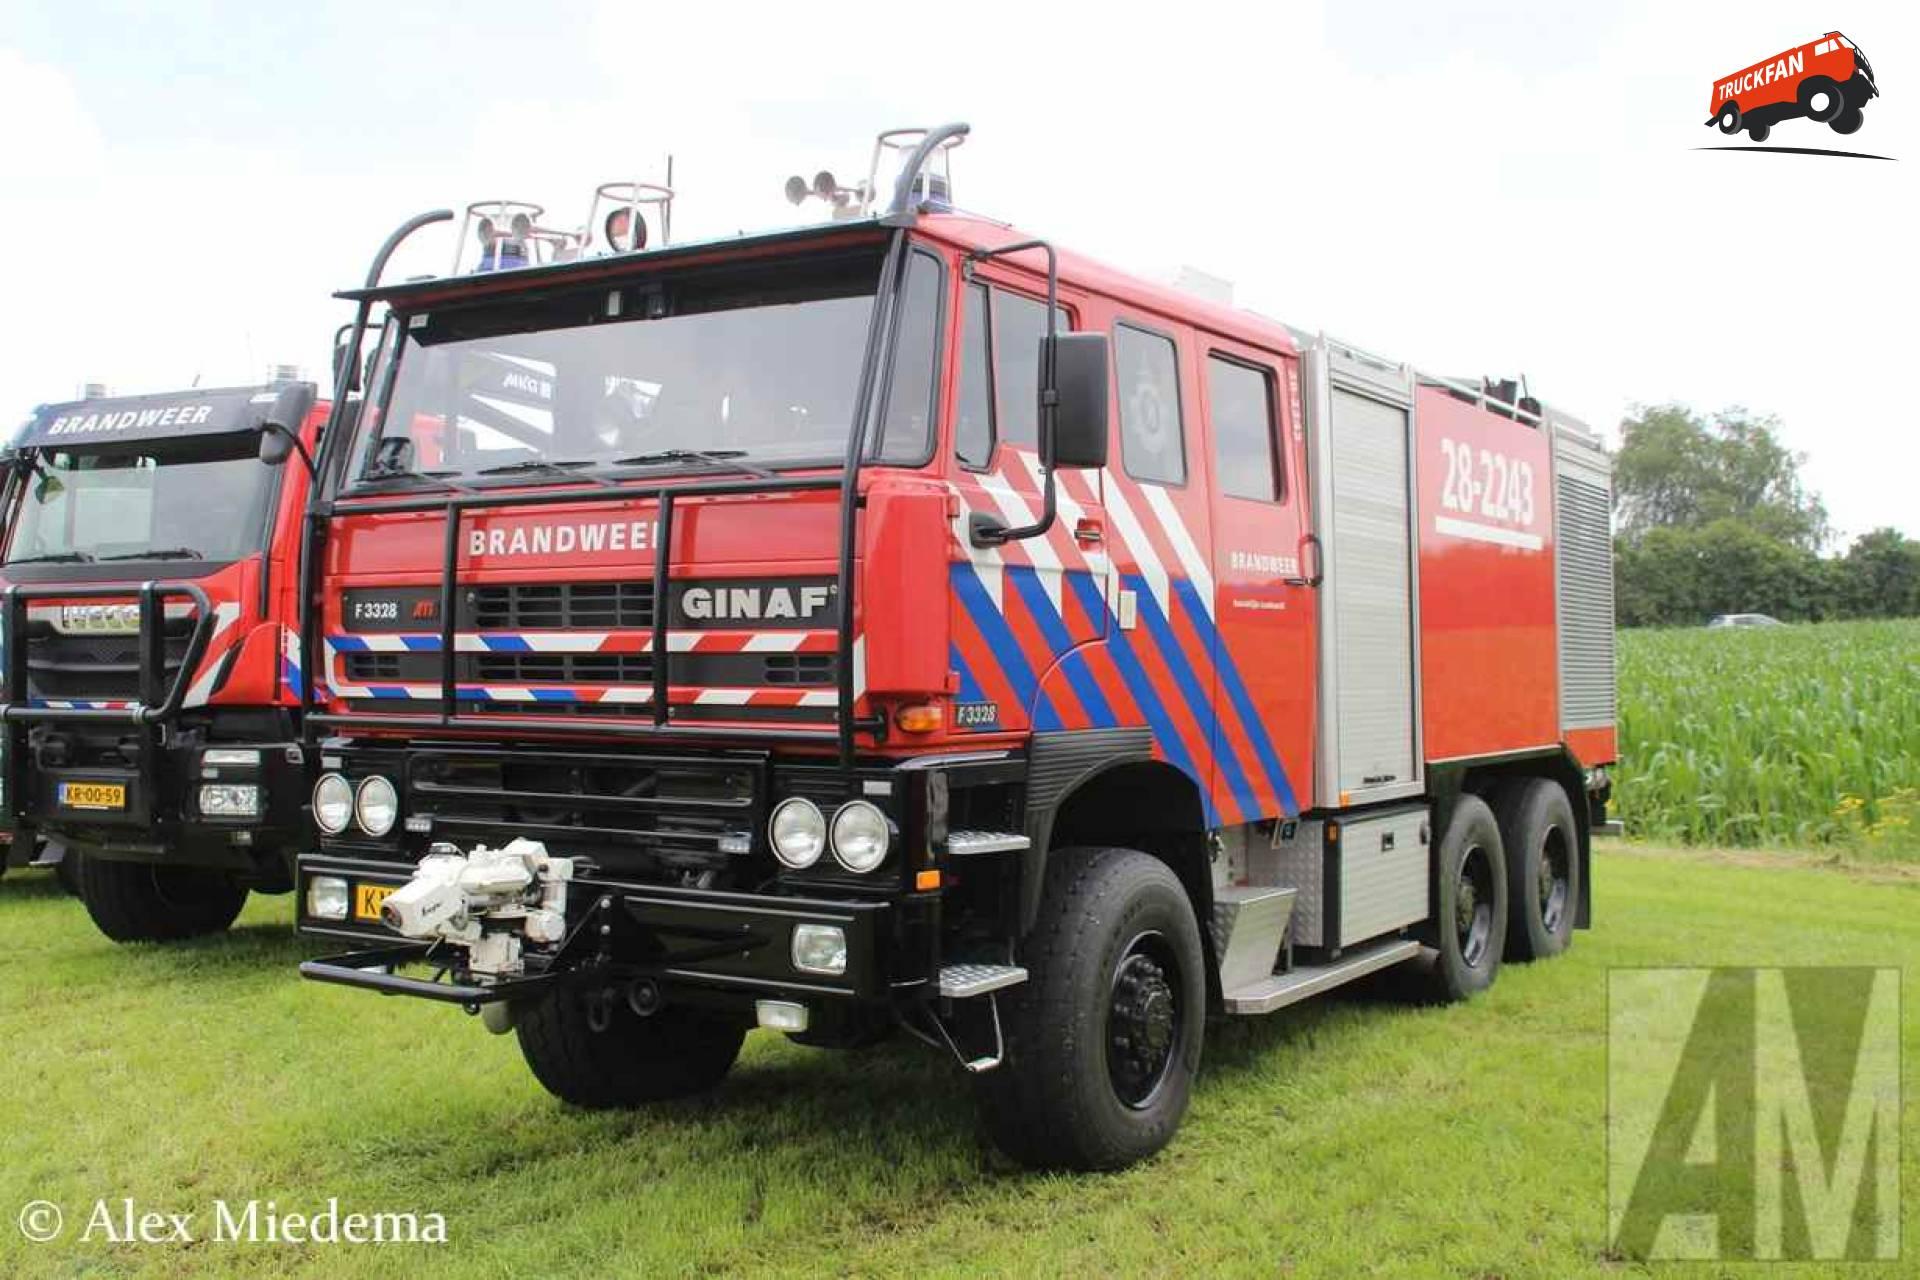 Ginaf F3328